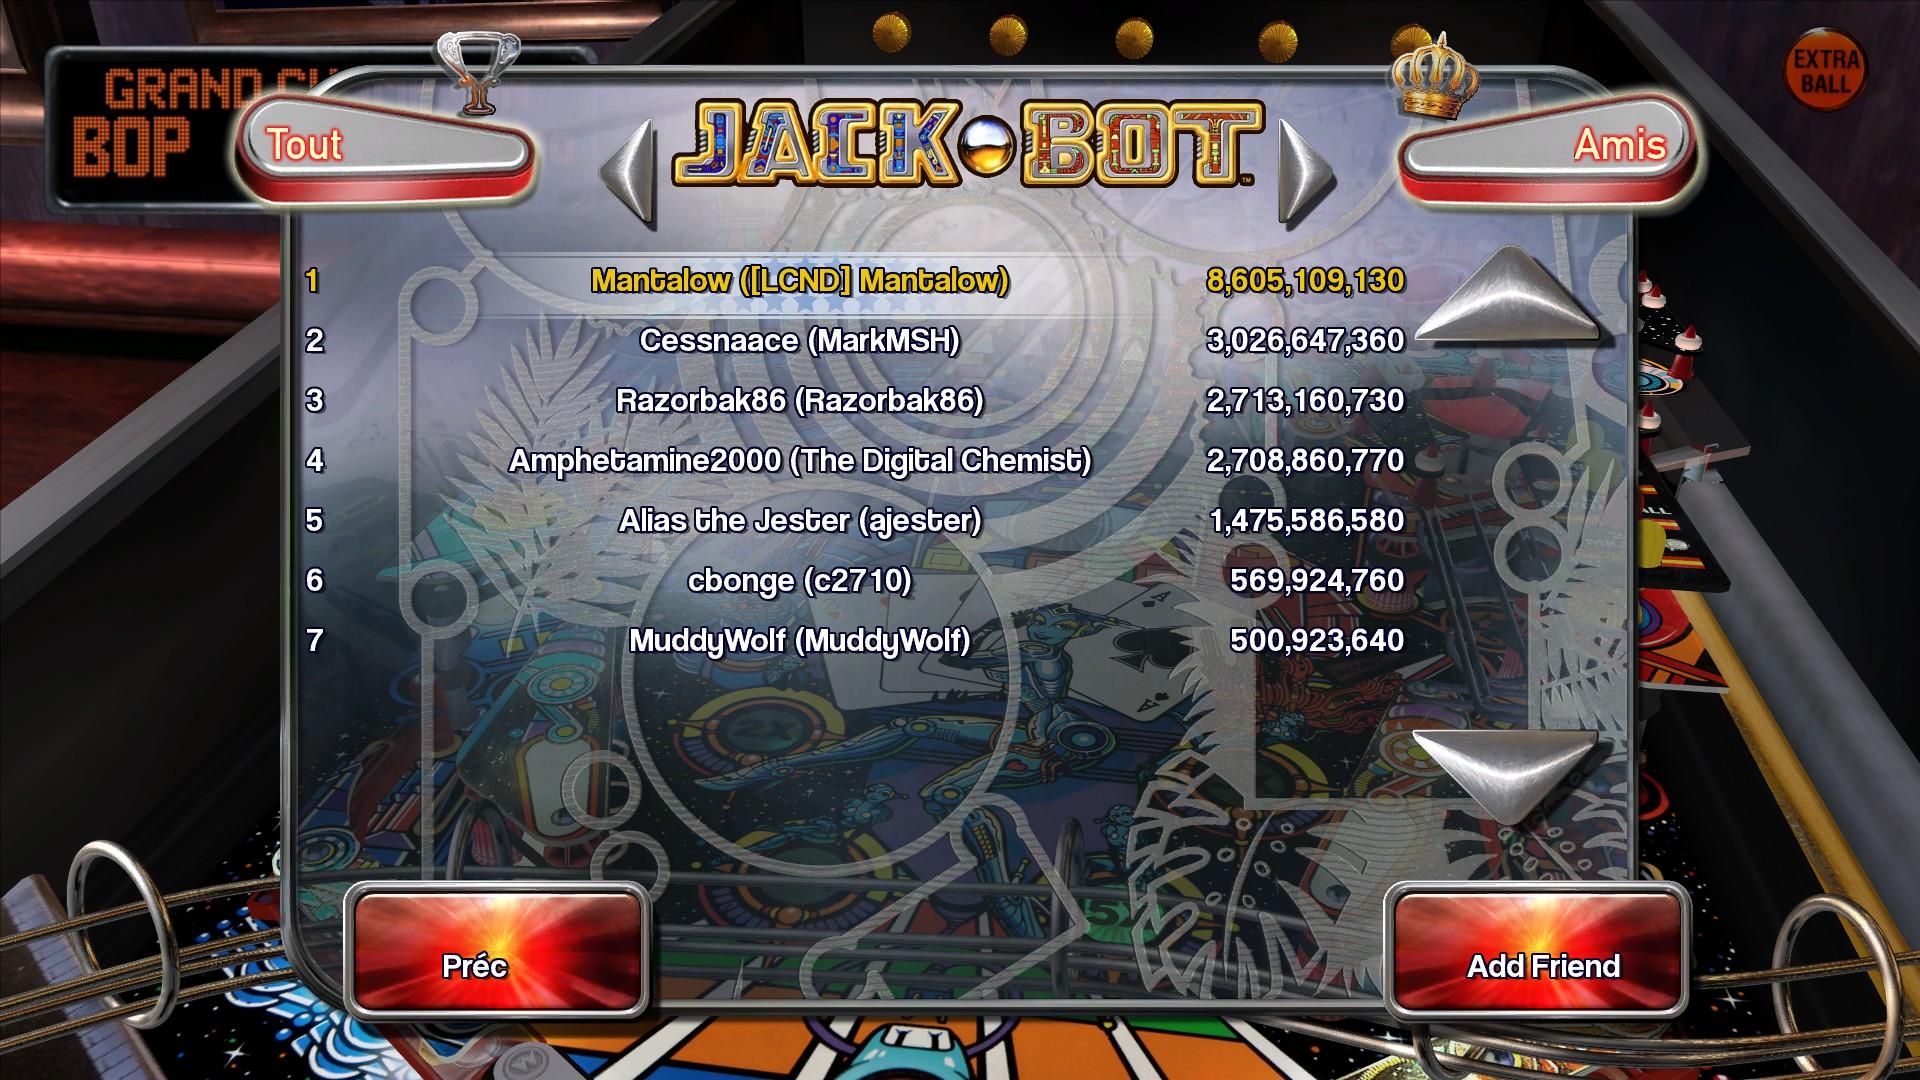 Mantalow: Pinball Arcade: Jack*Bot (PC) 8,605,109,130 points on 2015-08-29 11:08:24